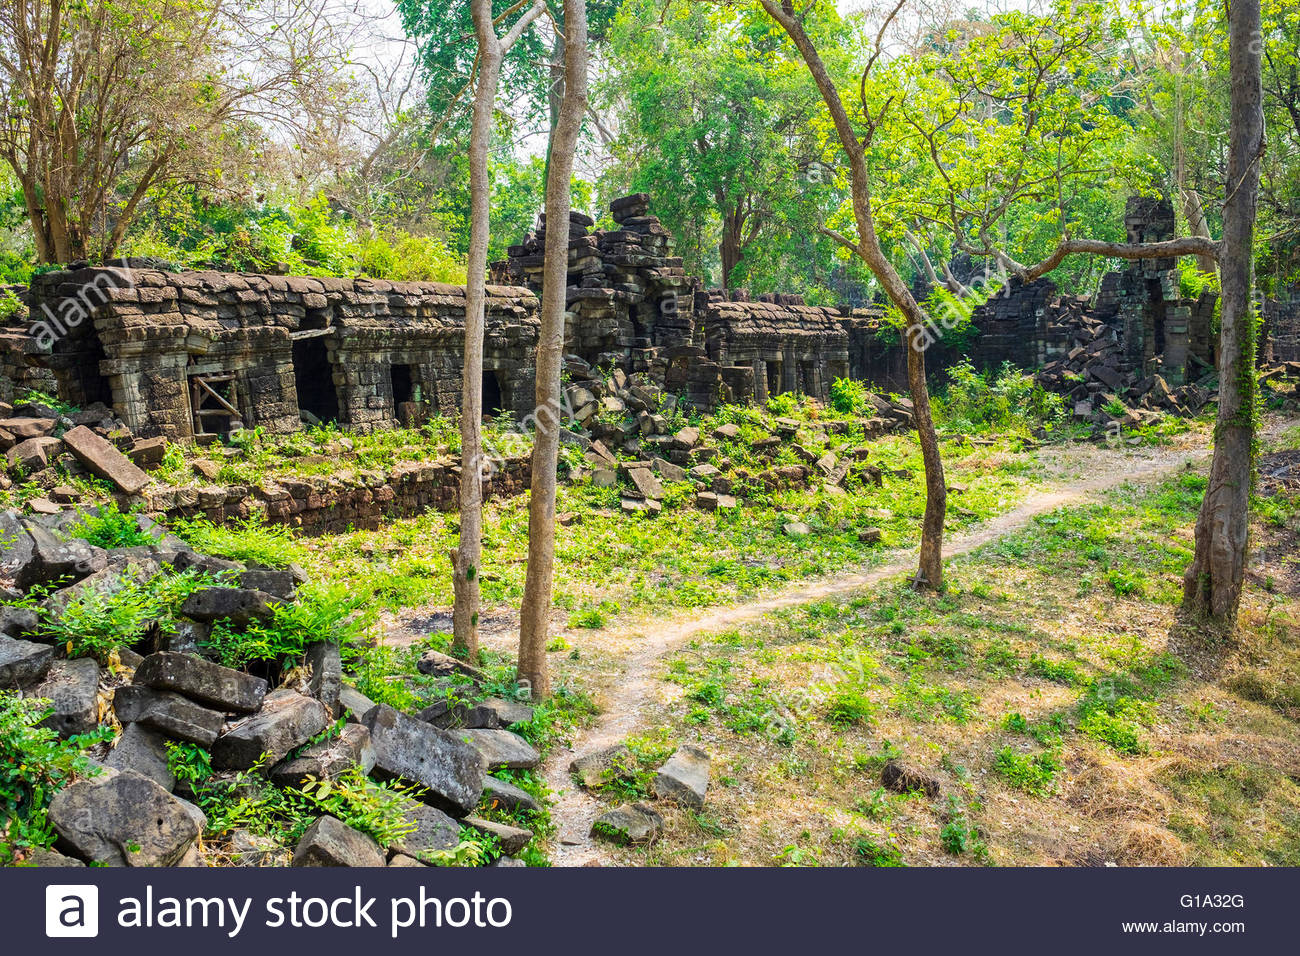 Banteay Chhmar, Angkorian-era temple ruins, Banteay Meanchey Province, Cambodia - Stock Image